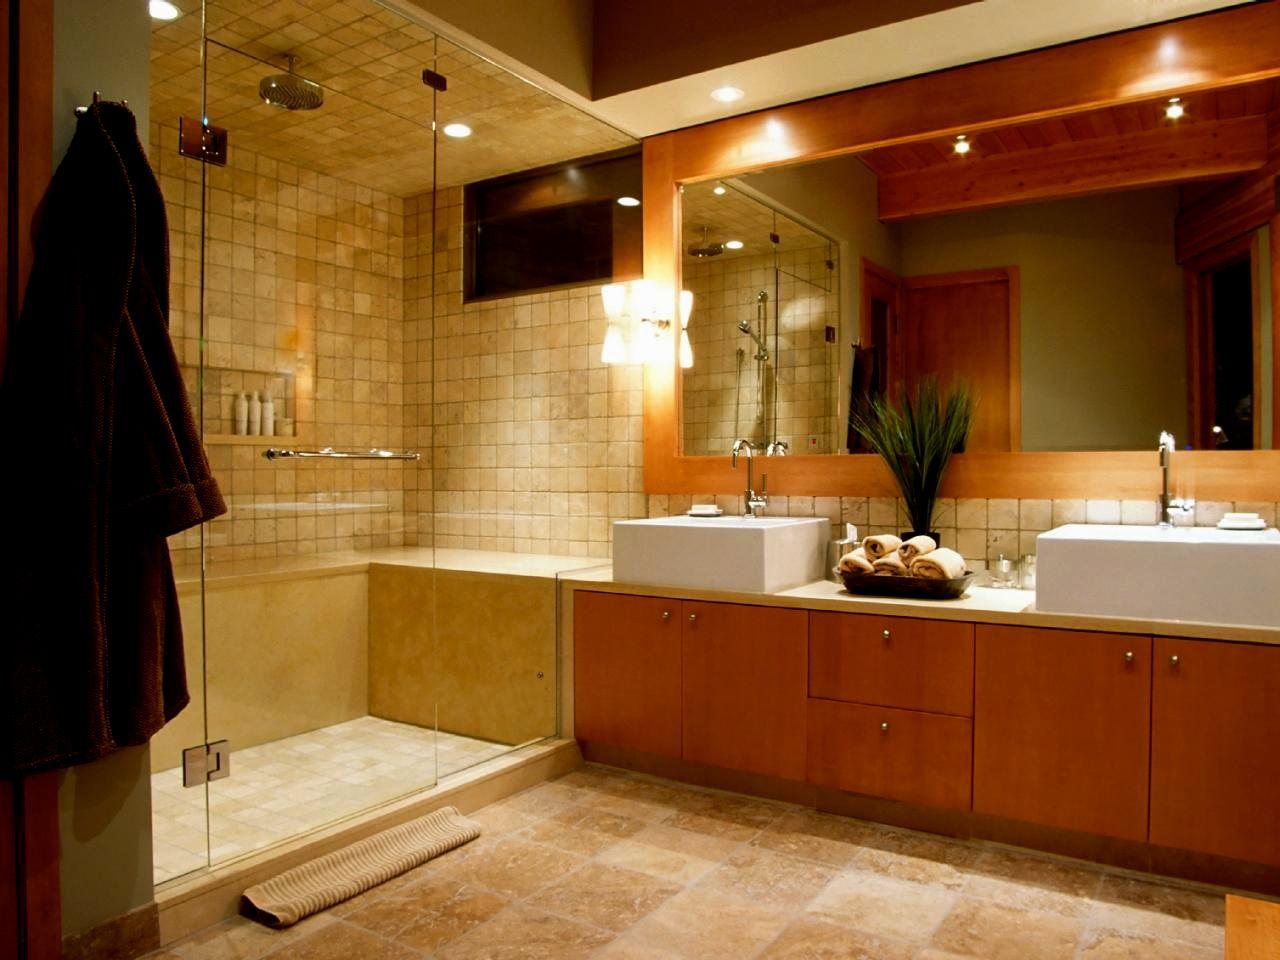 beautiful bathroom heat lamp ideas-Incredible Bathroom Heat Lamp Photo